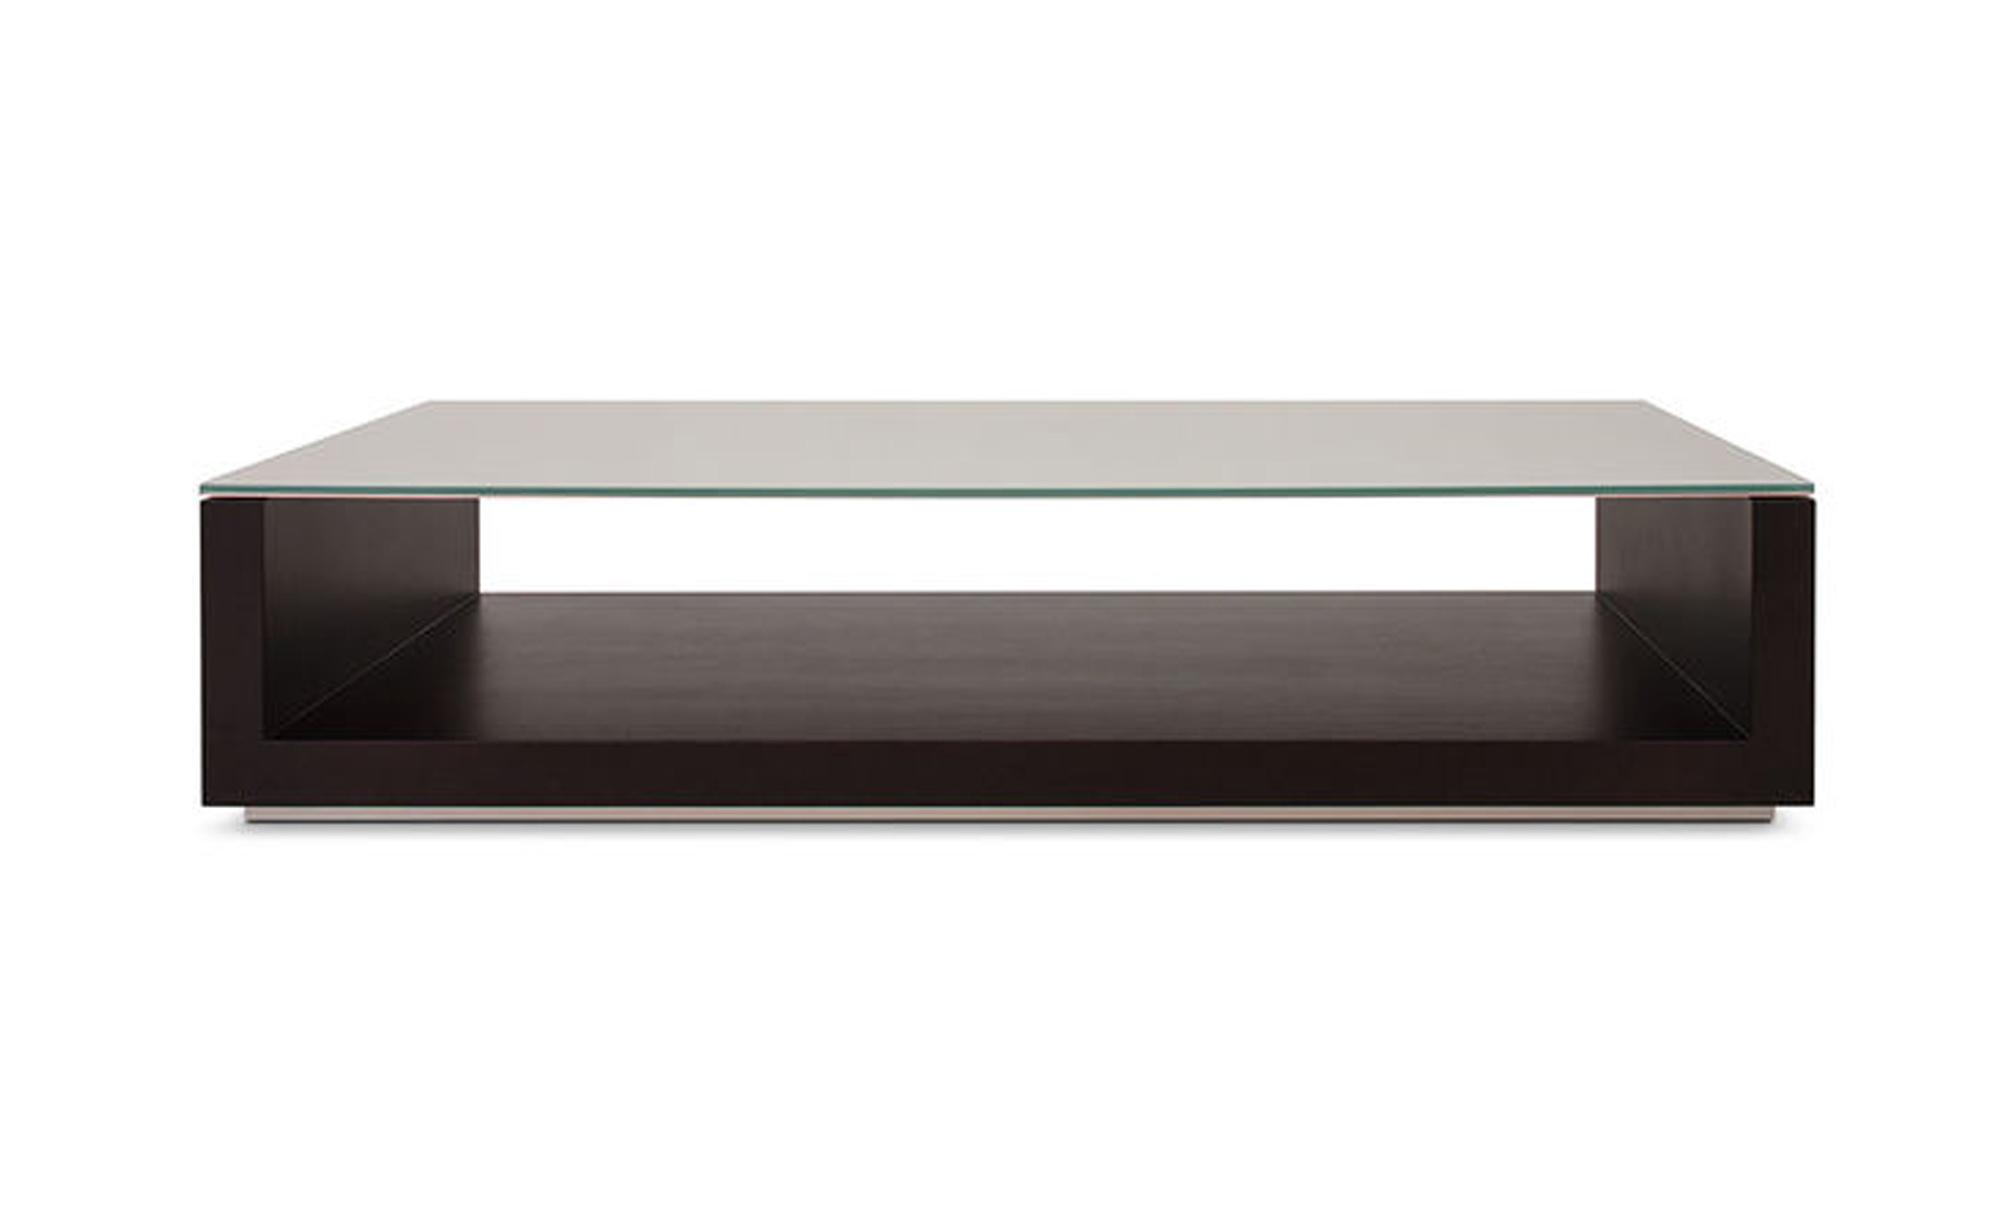 Designer Coffee Tables Sydney & Melbourne Fanuli Furniture